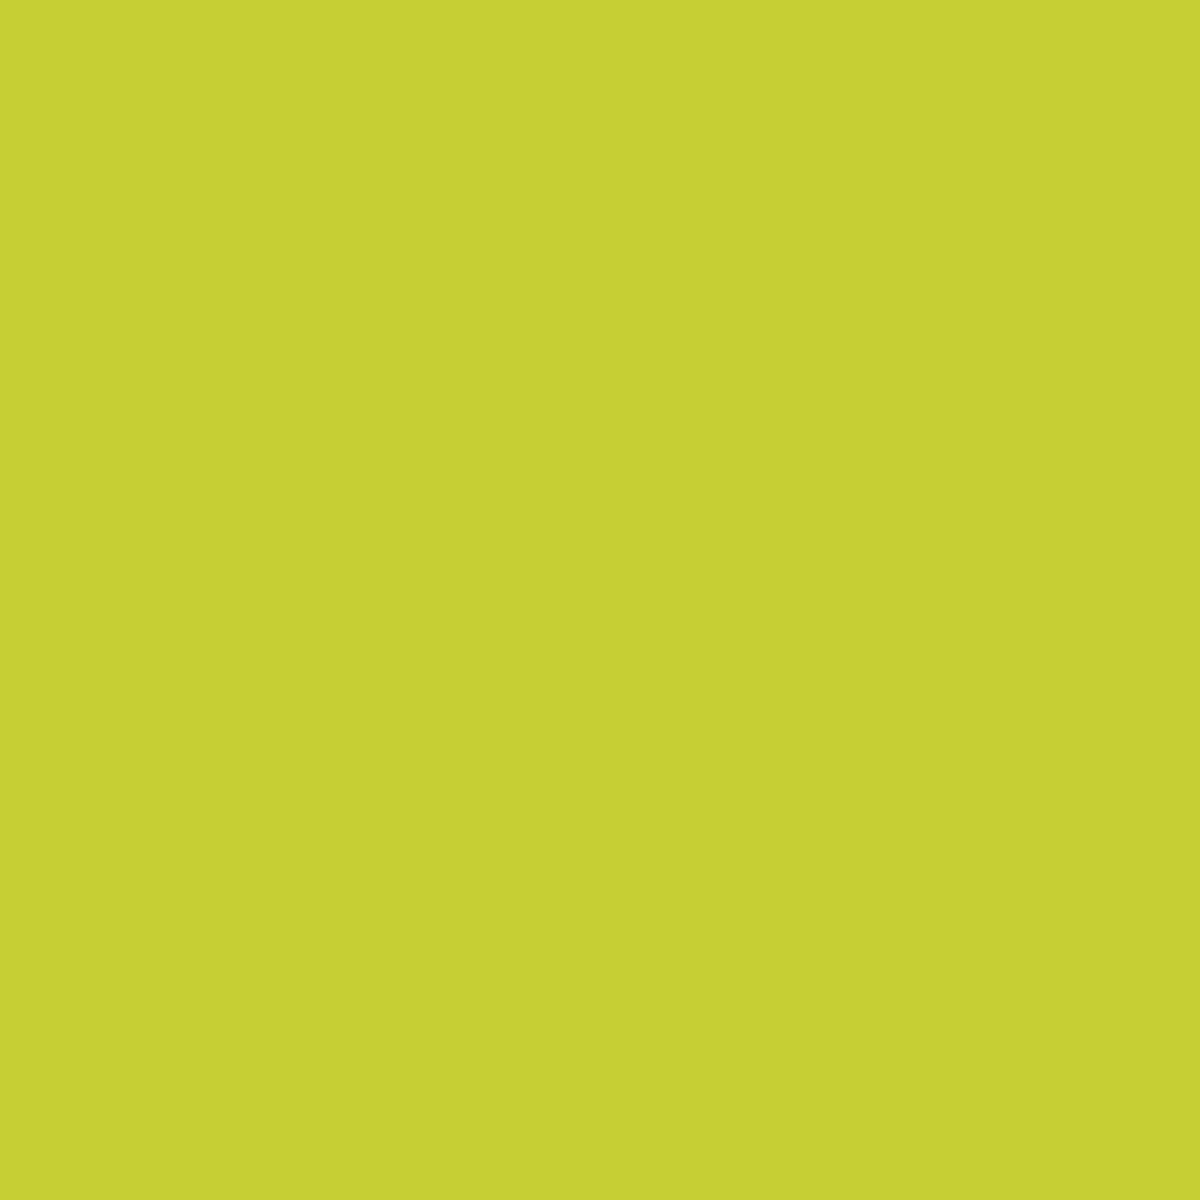 Riley Blake, Confetti Solid Lime